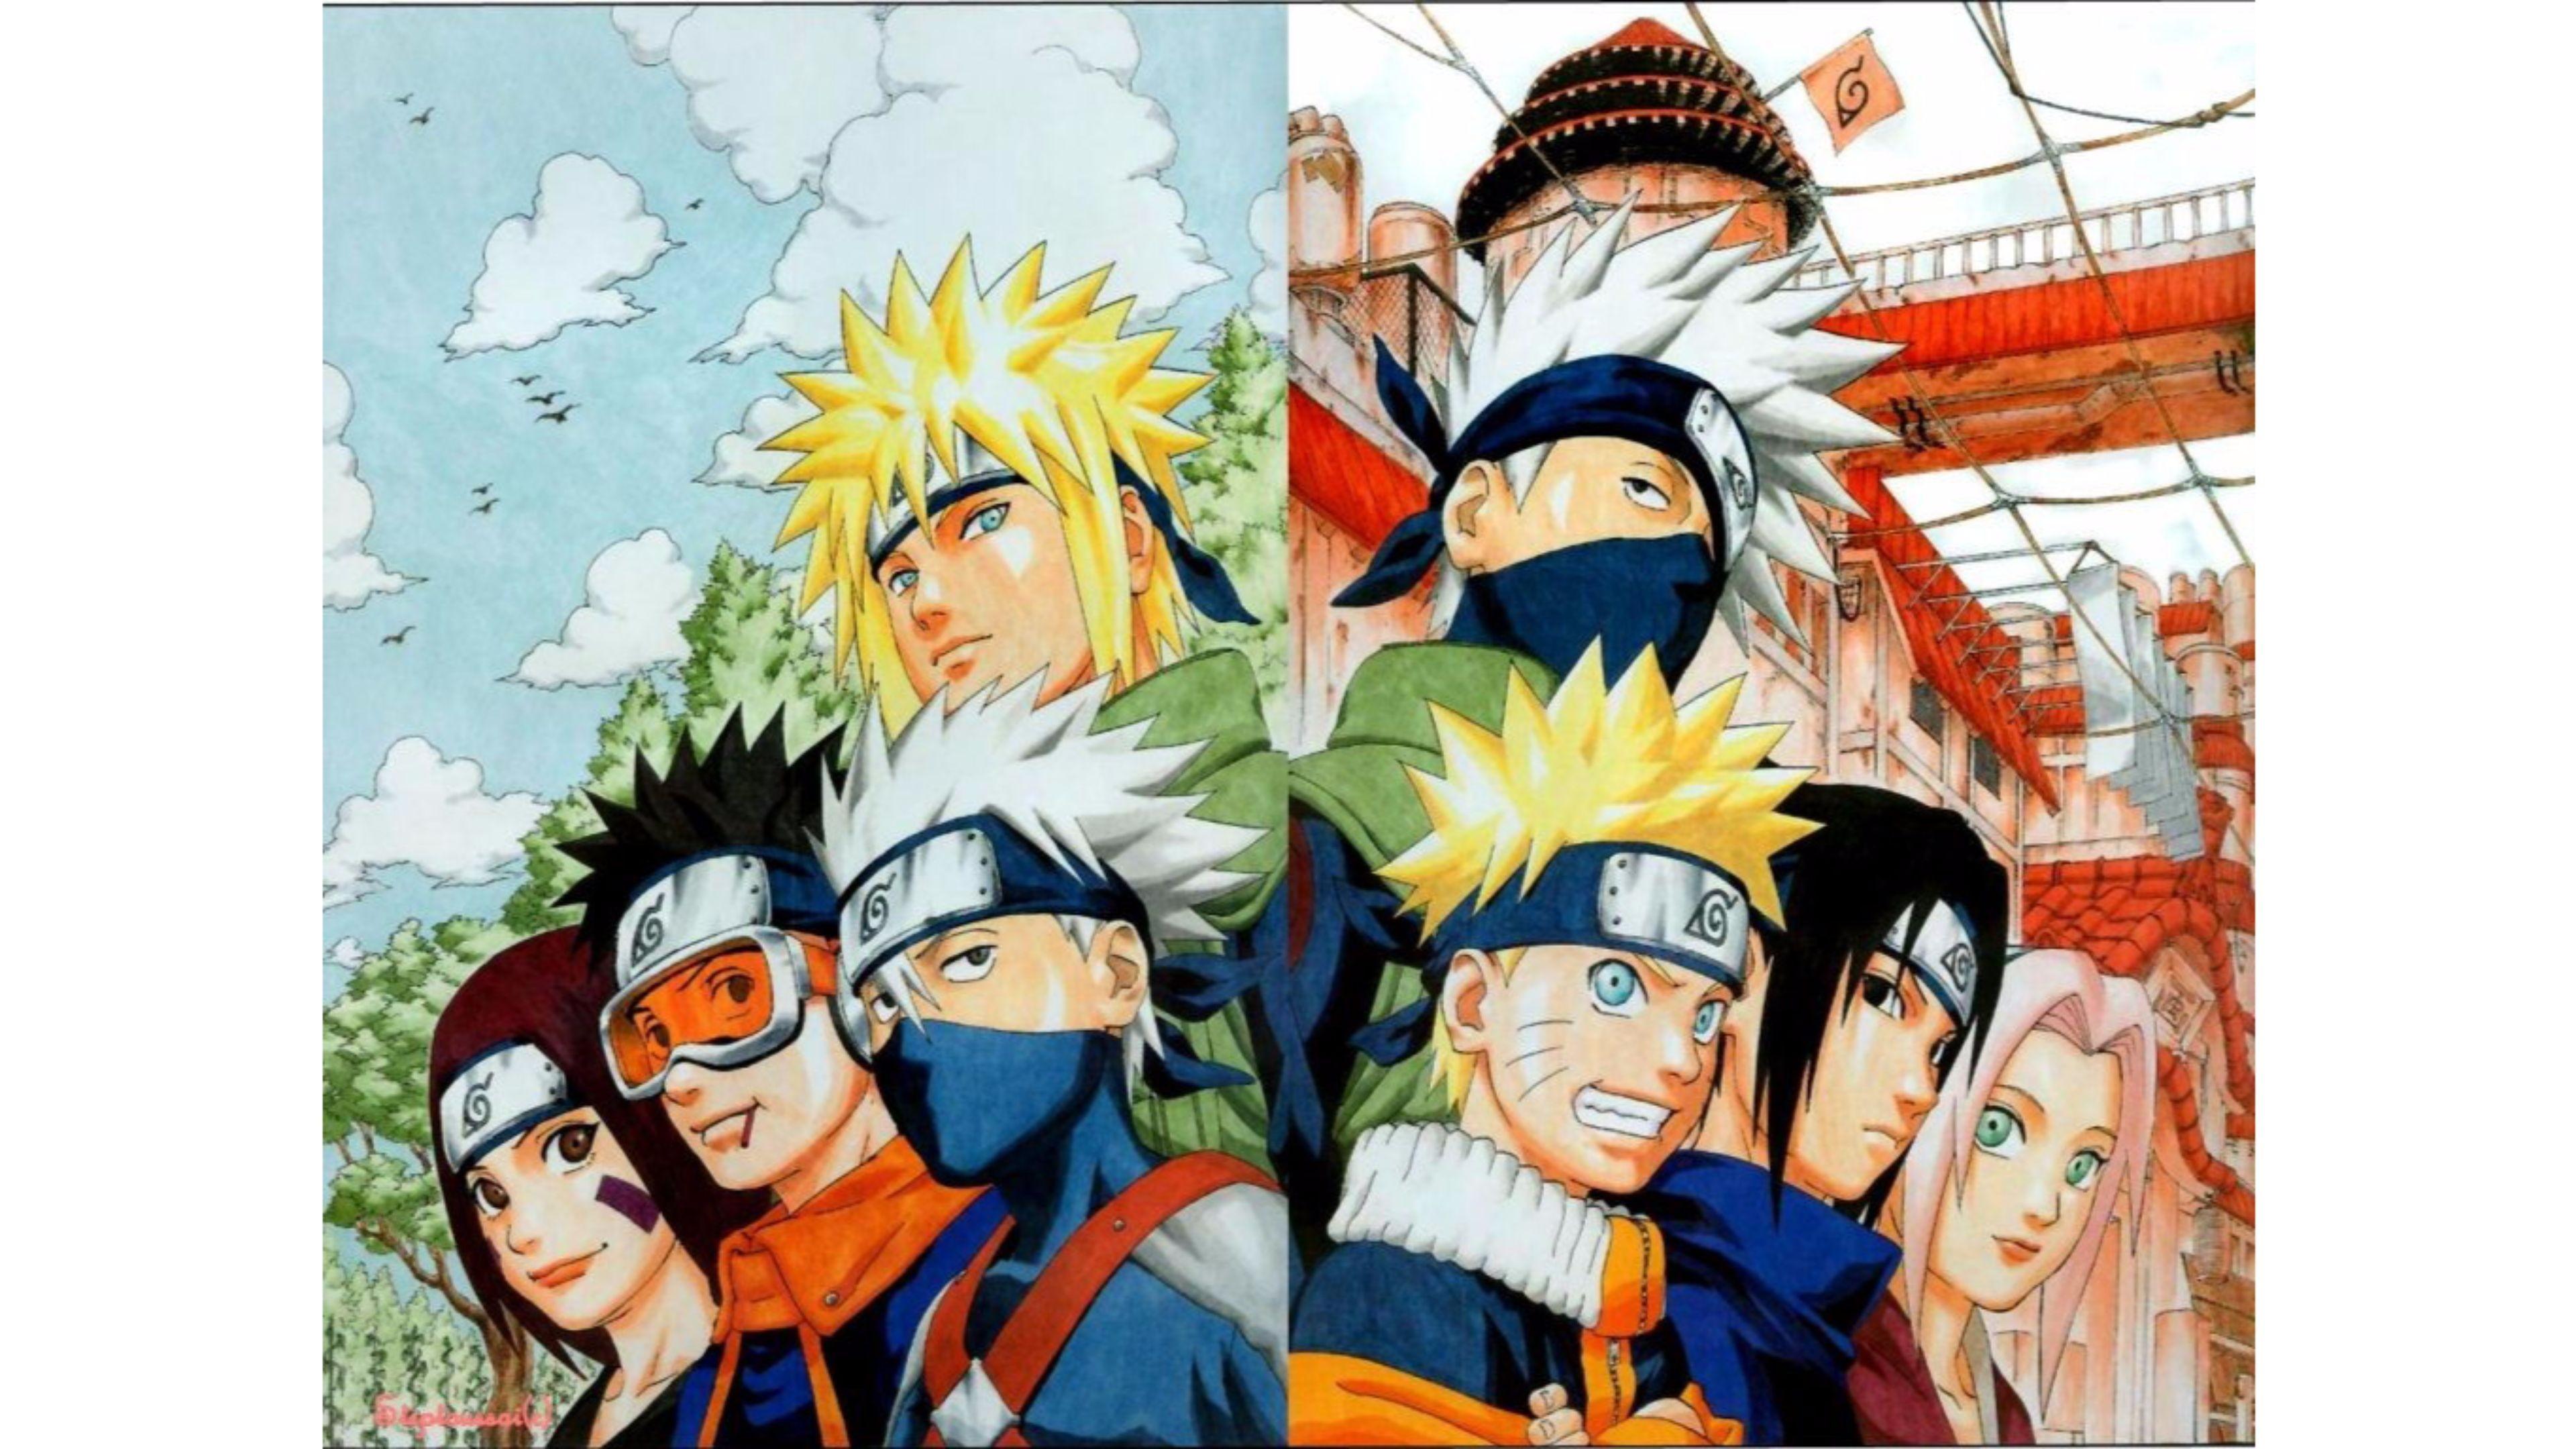 Download 9000 Wallpaper Anime 4k Full Hd HD Gratis